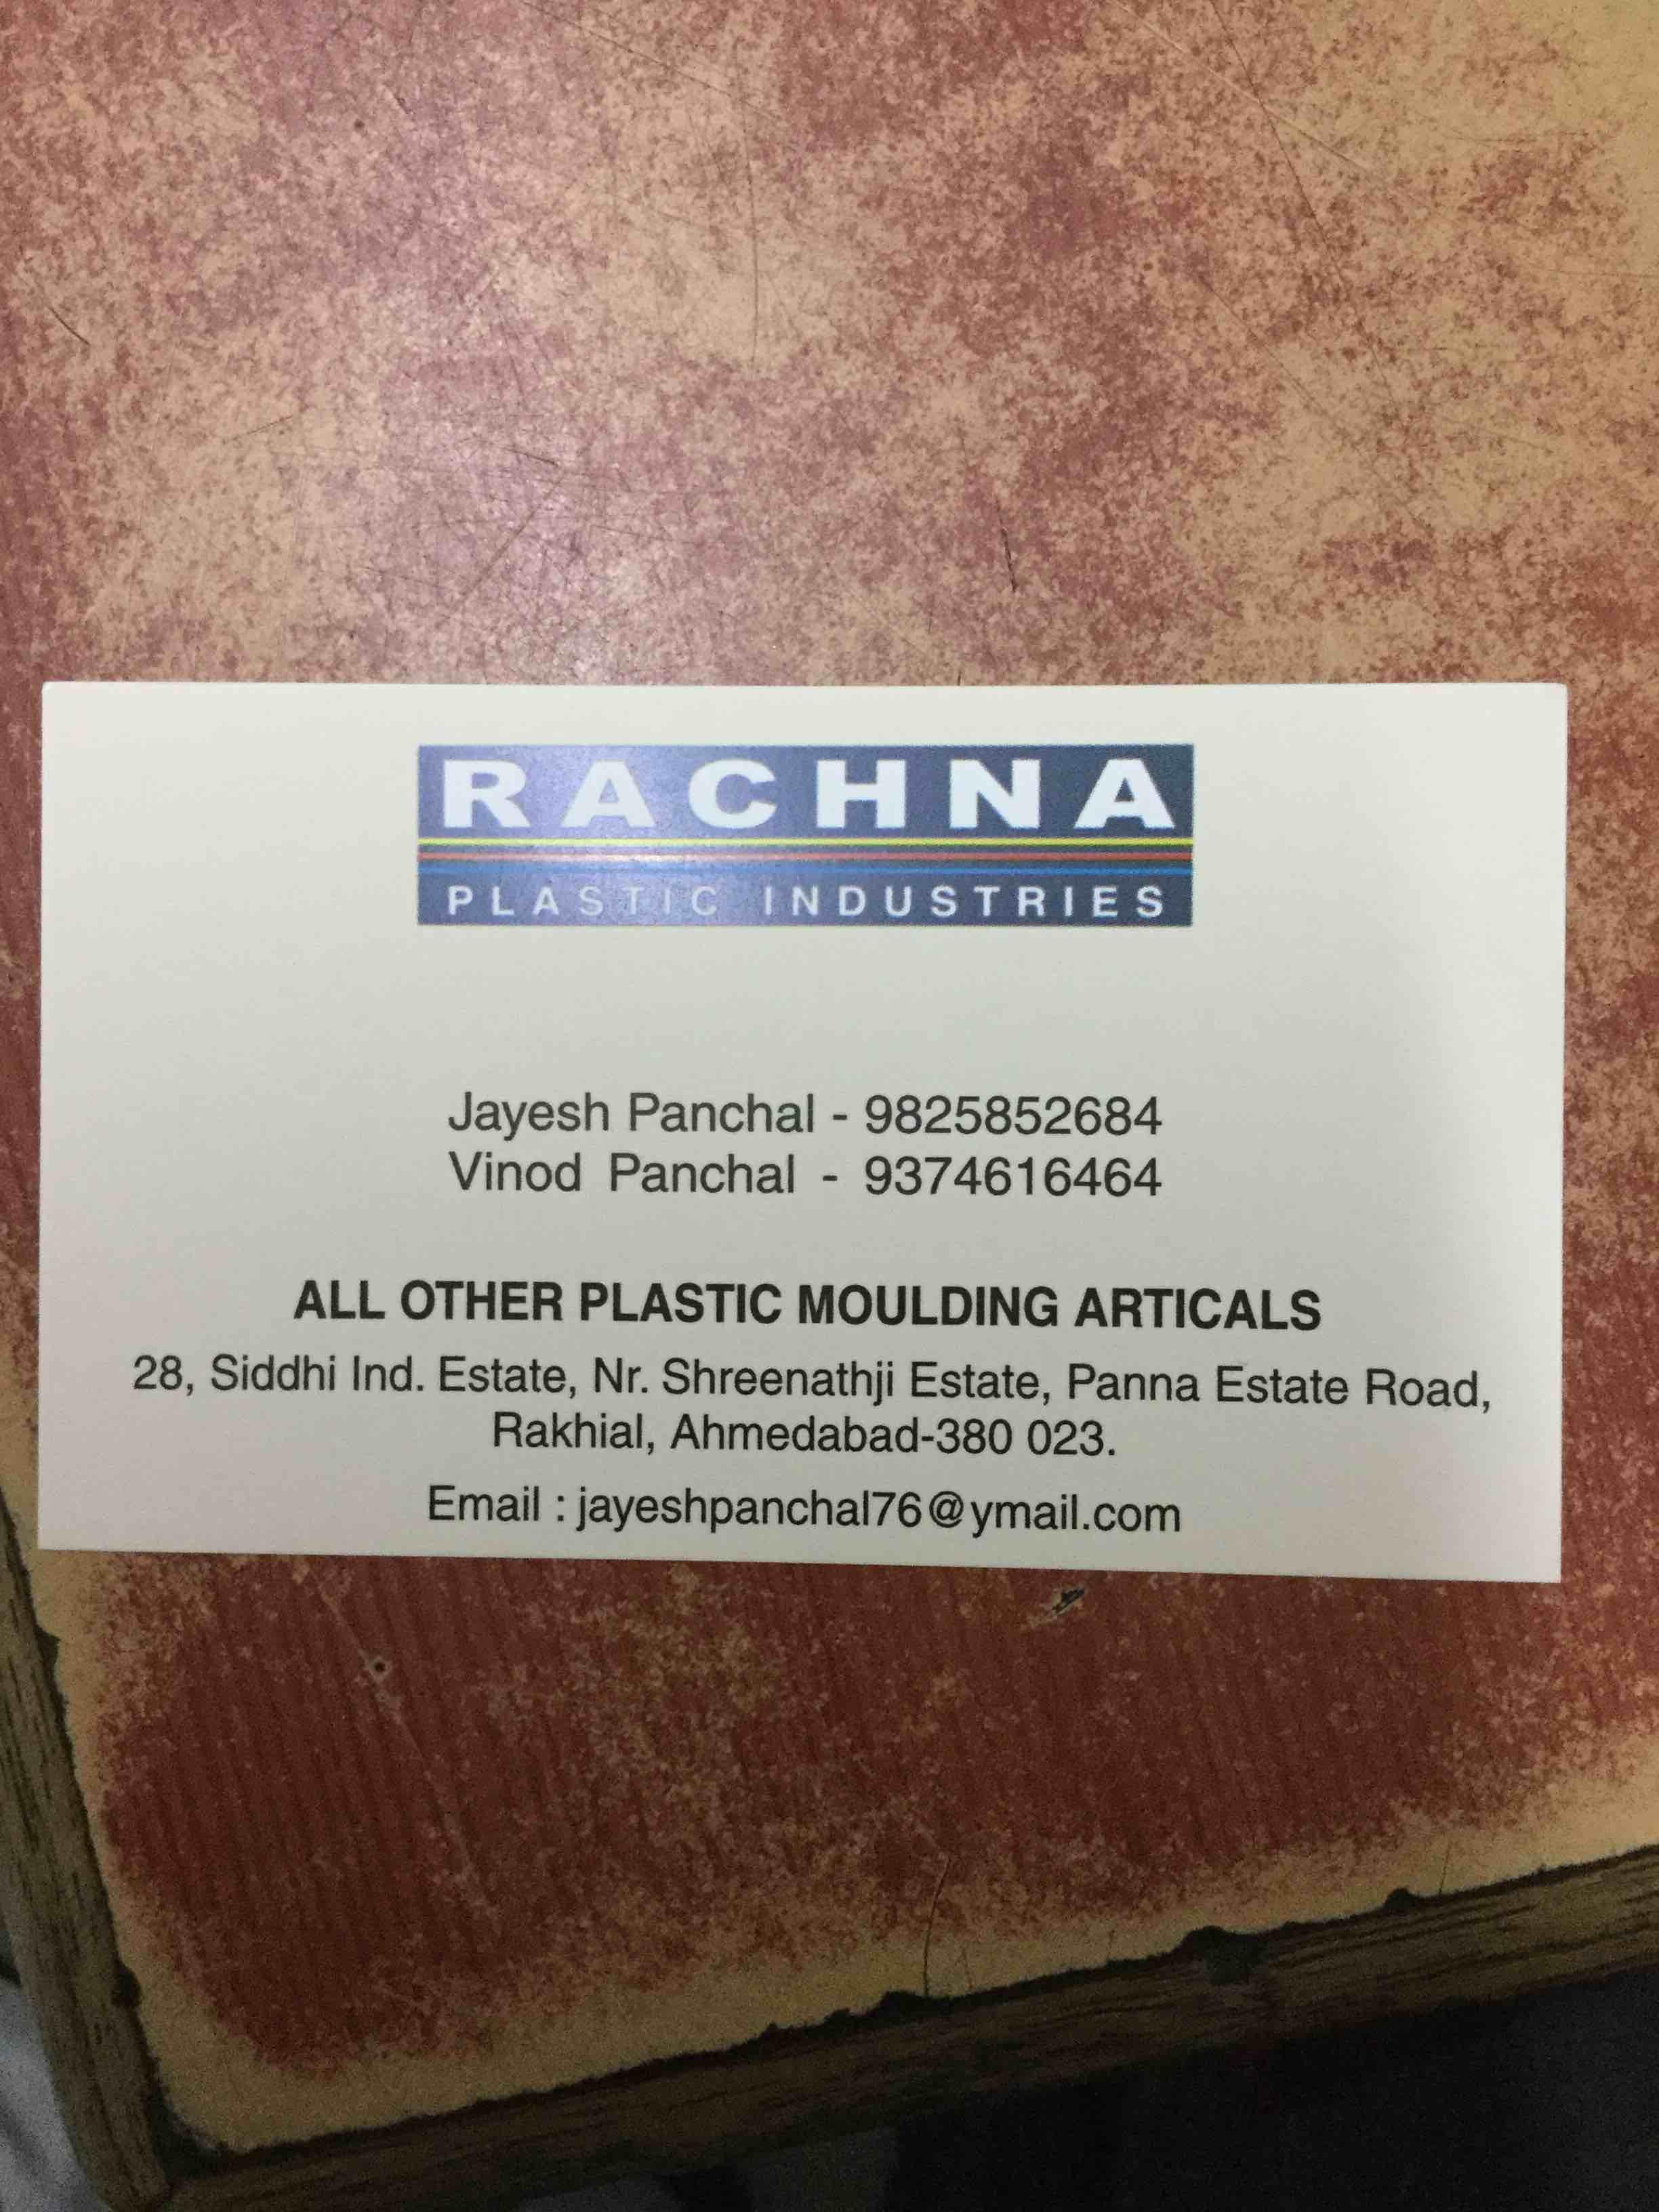 Rachna Plastic Industries